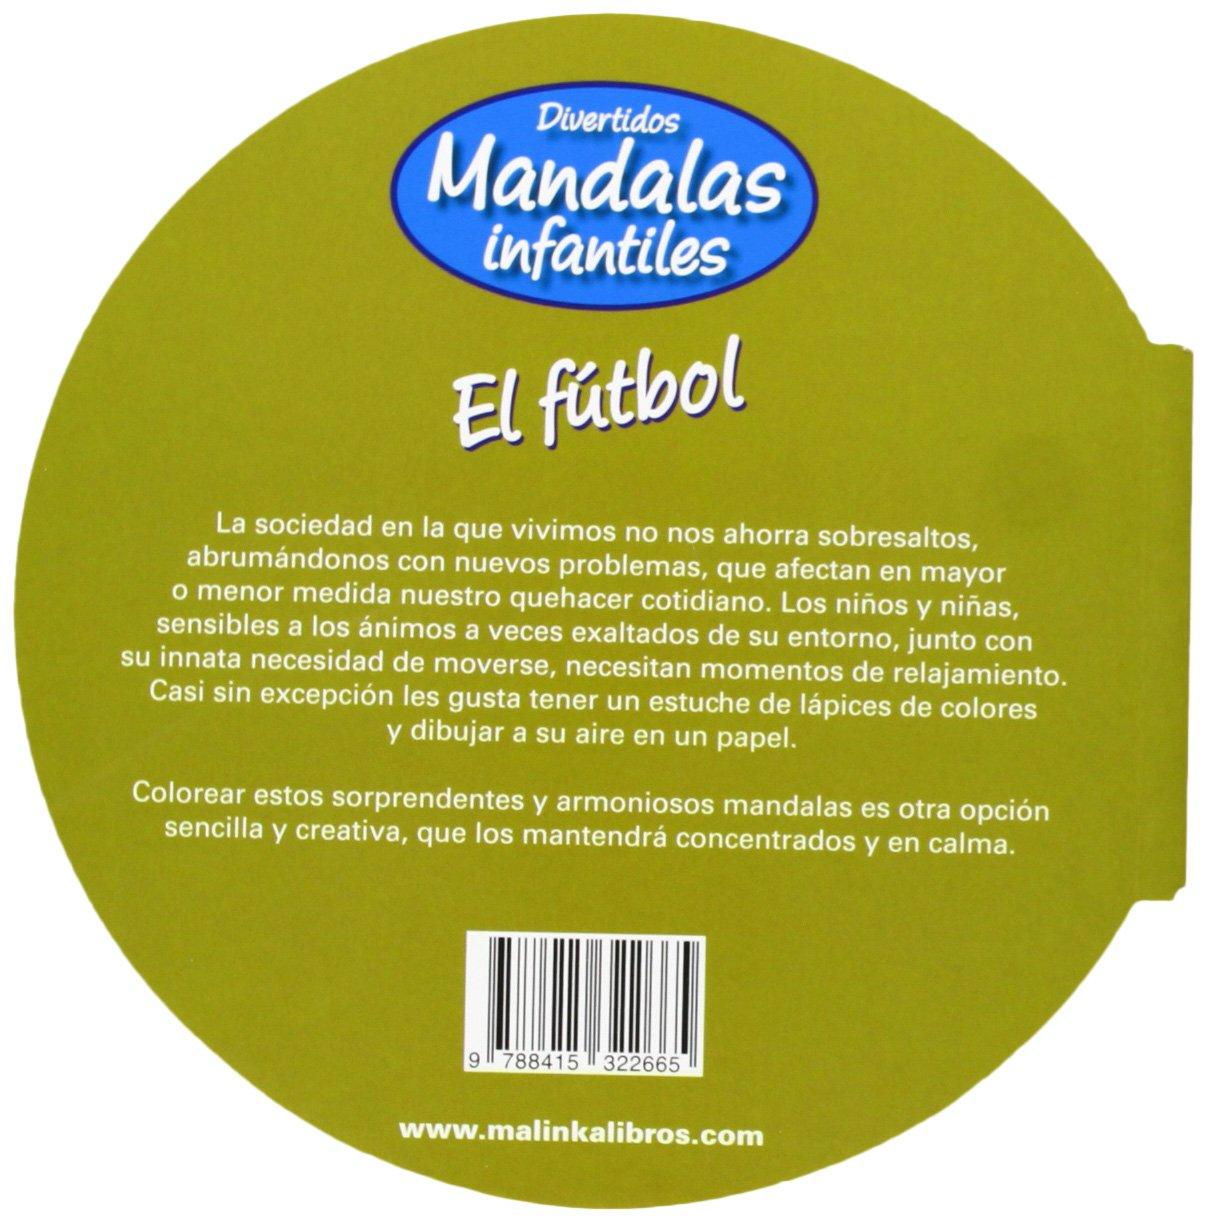 El fútbol (Mandalas infantiles) (Spanish Edition): Roger ...